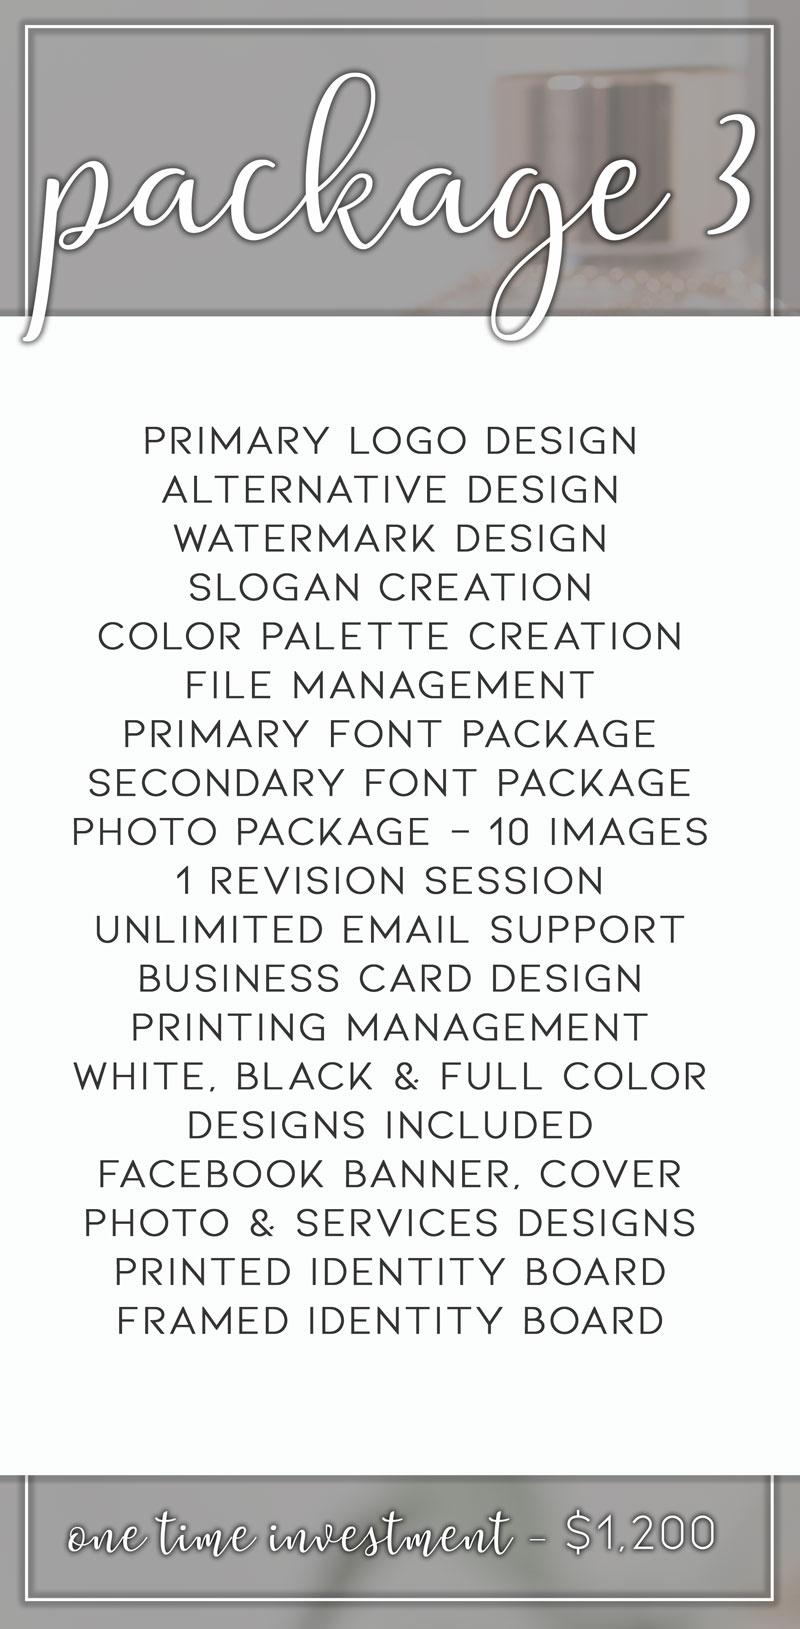 Branding Package #3 - Badass Marketing Solutions